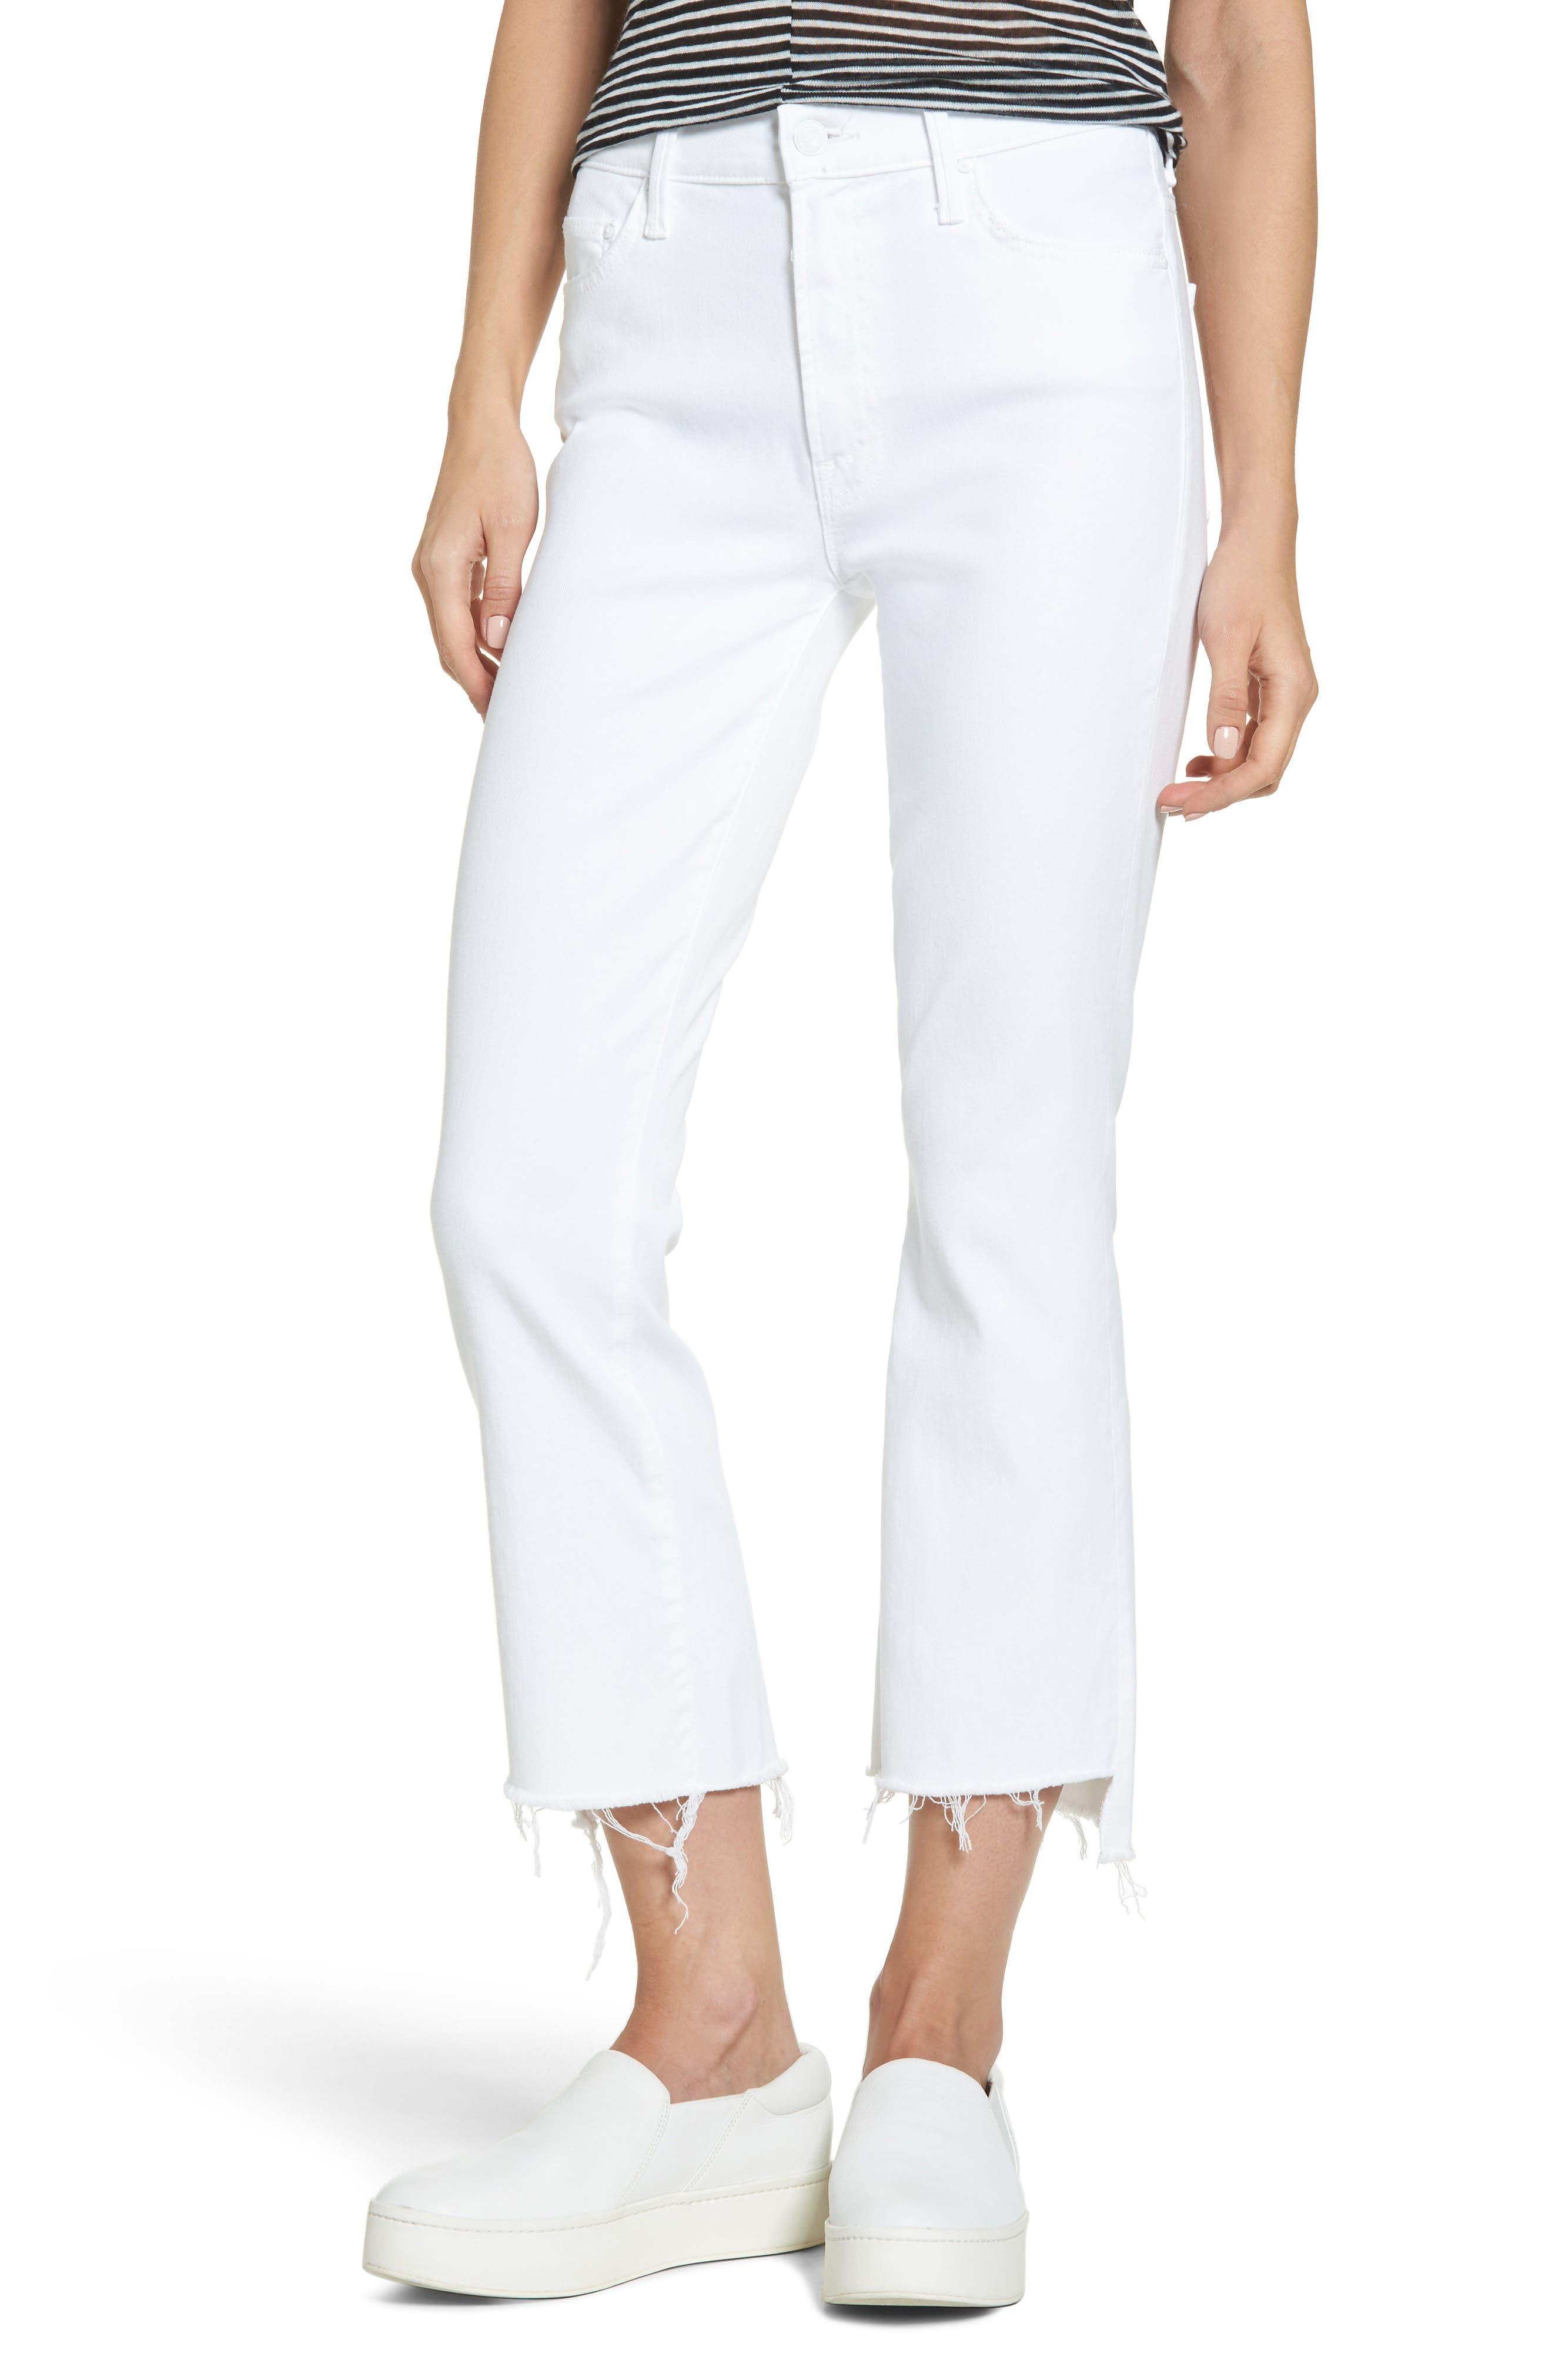 MOTHER The Insider Step Hem Crop Bootcut Jeans, Main, color, 100